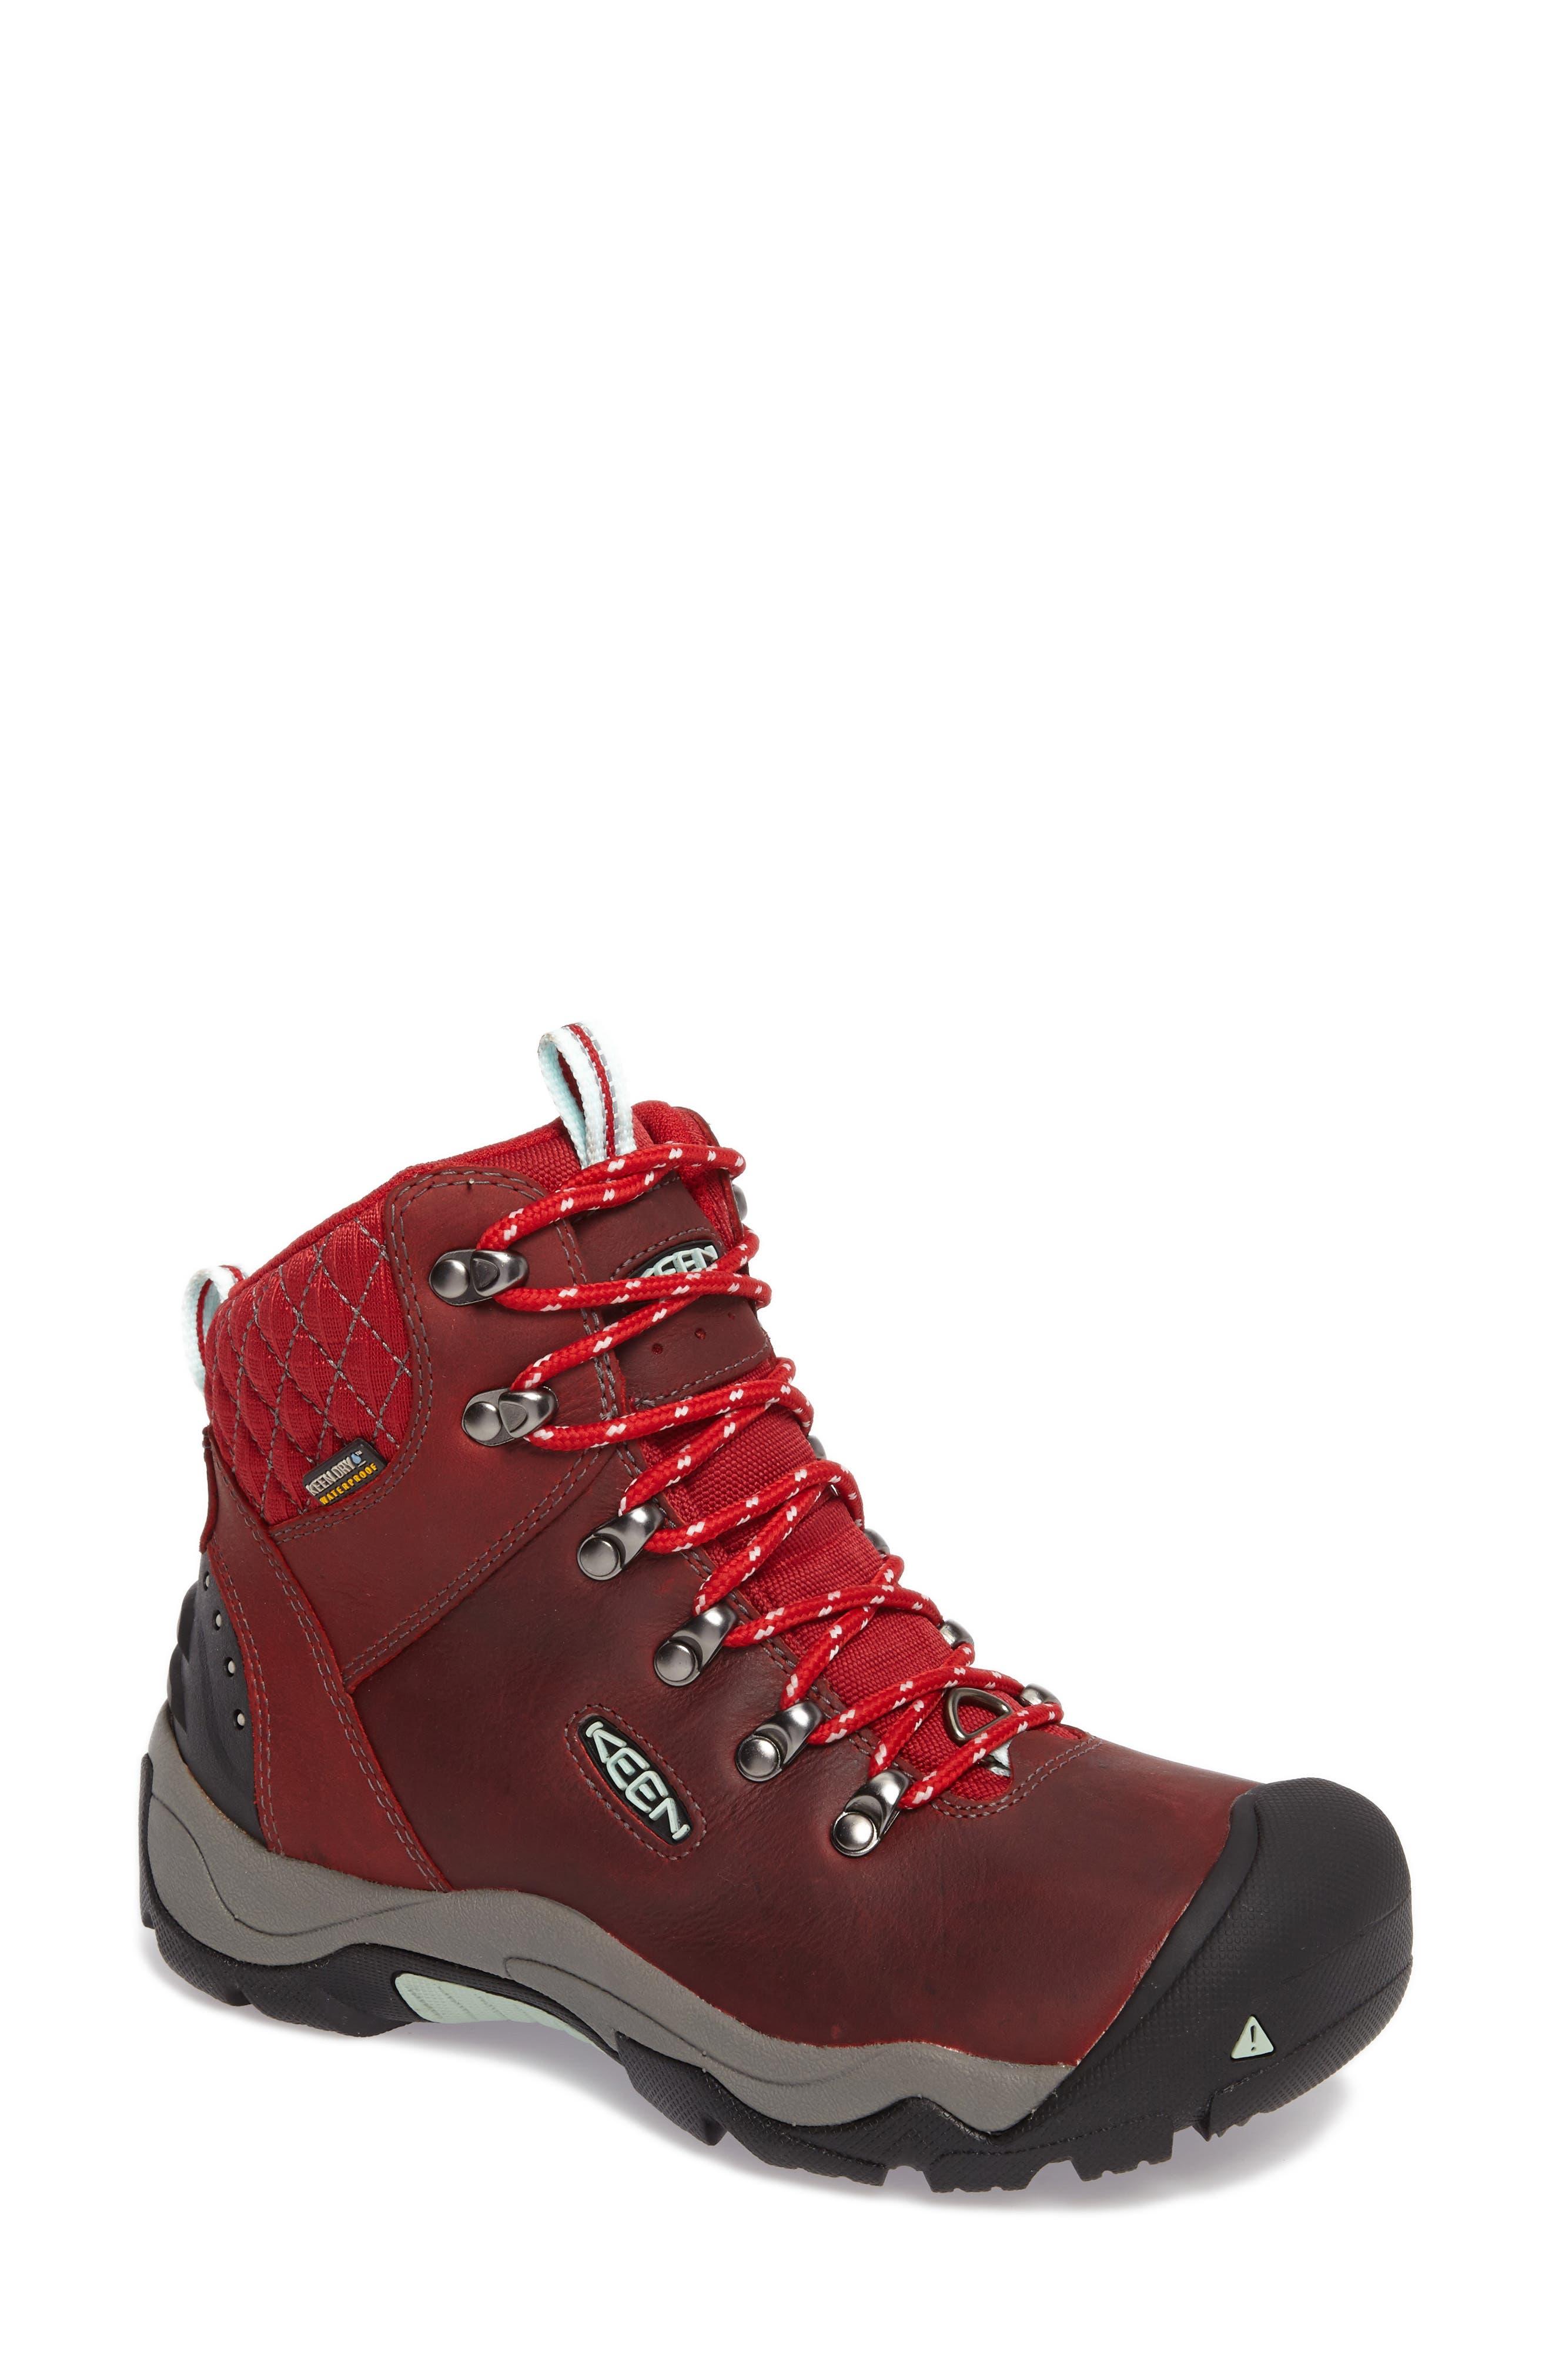 Alternate Image 1 Selected - Keen Revel III Waterproof Hiking Boot (Women)